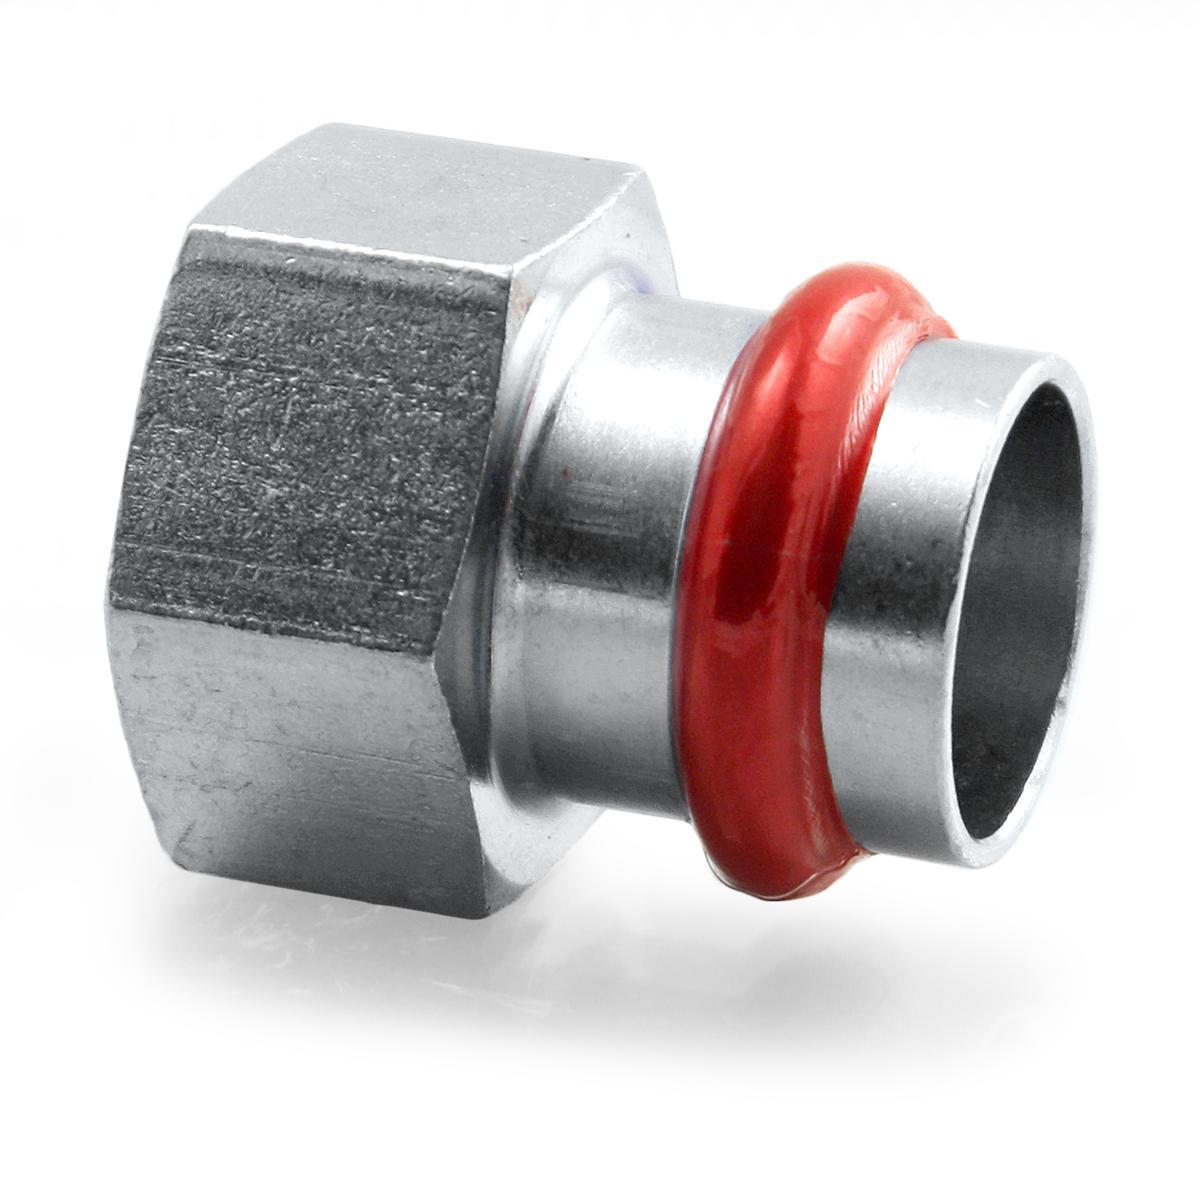 Press Steel Straight Female 1/2Fx22